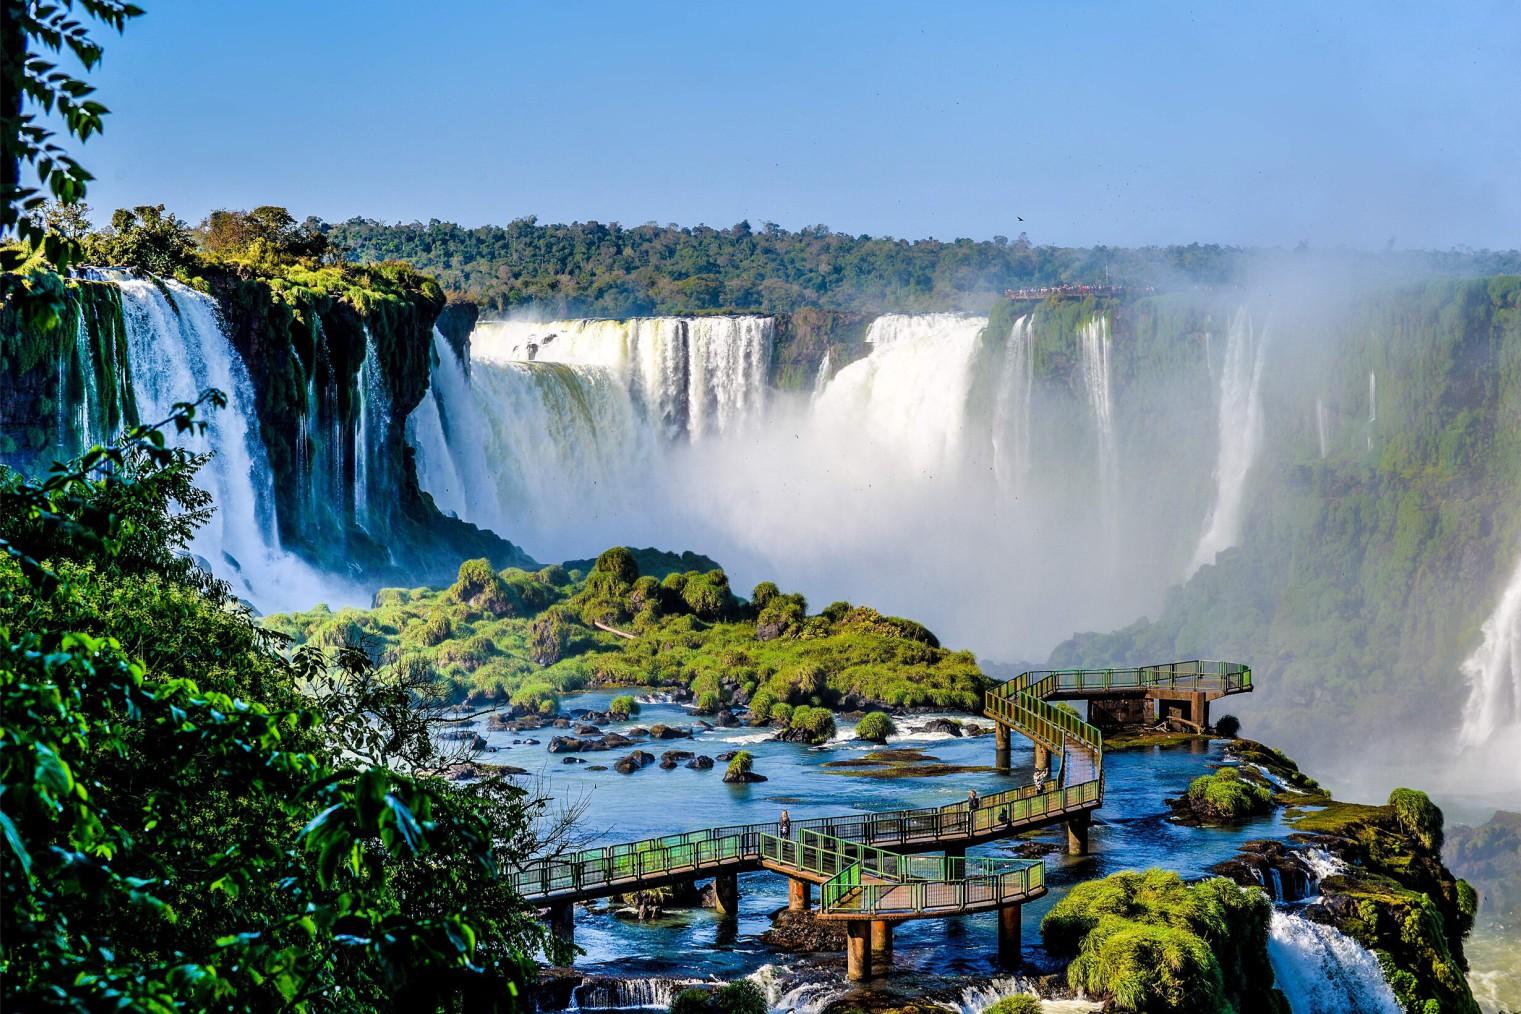 Iguazu Falls. Travel. Водопады Игуасу, туризм